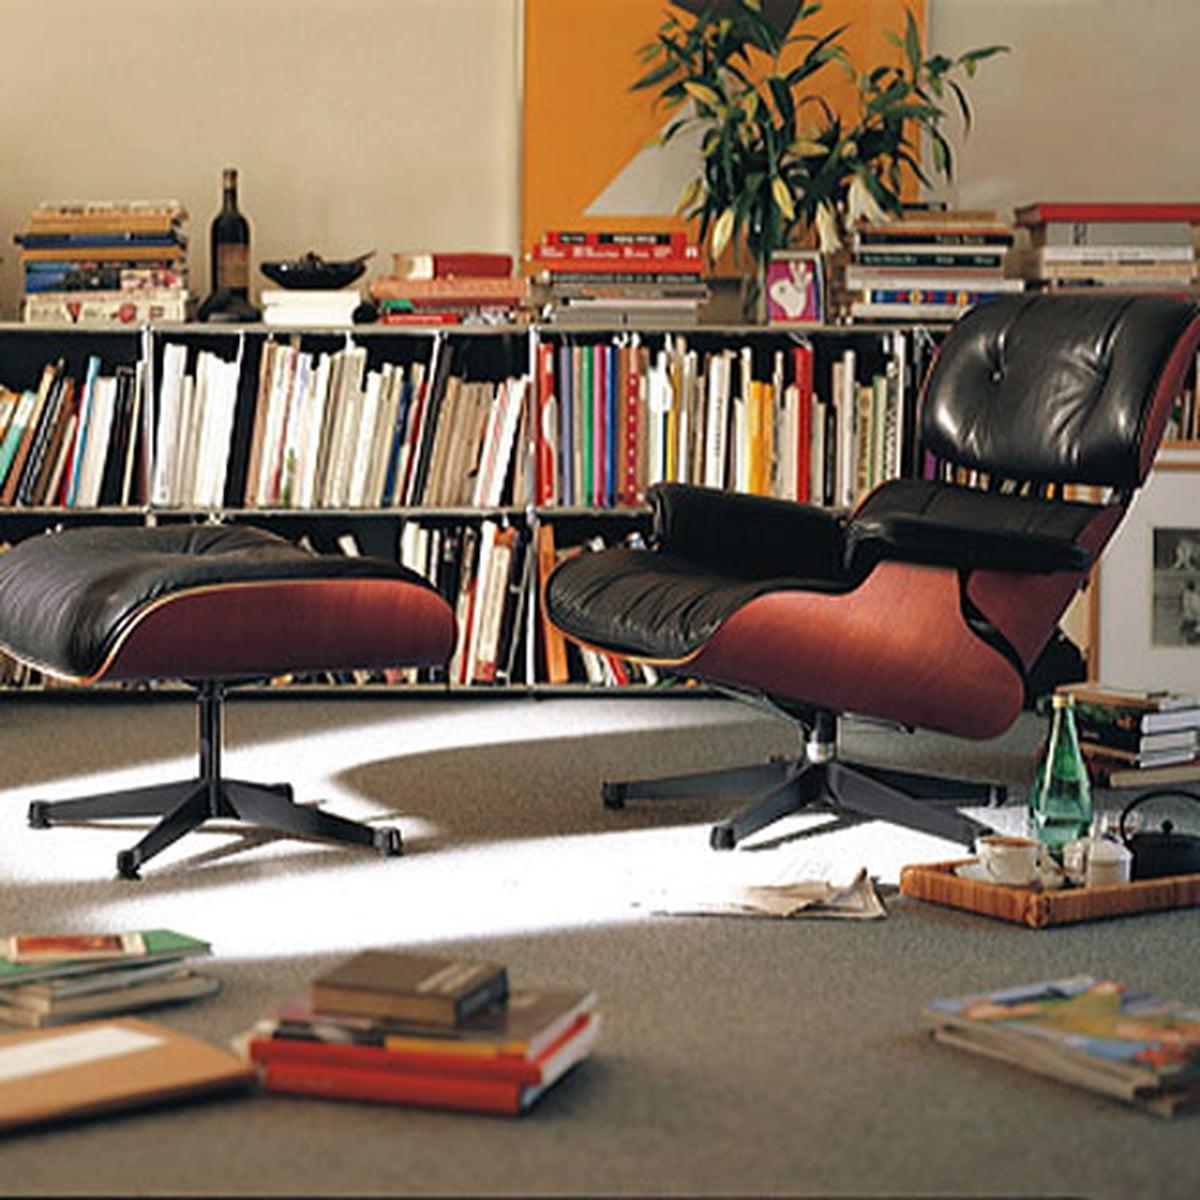 Vitra lounge chair amp ottoman white version von charles amp ray eames - Lounge Chair And Ottoman By Vitra